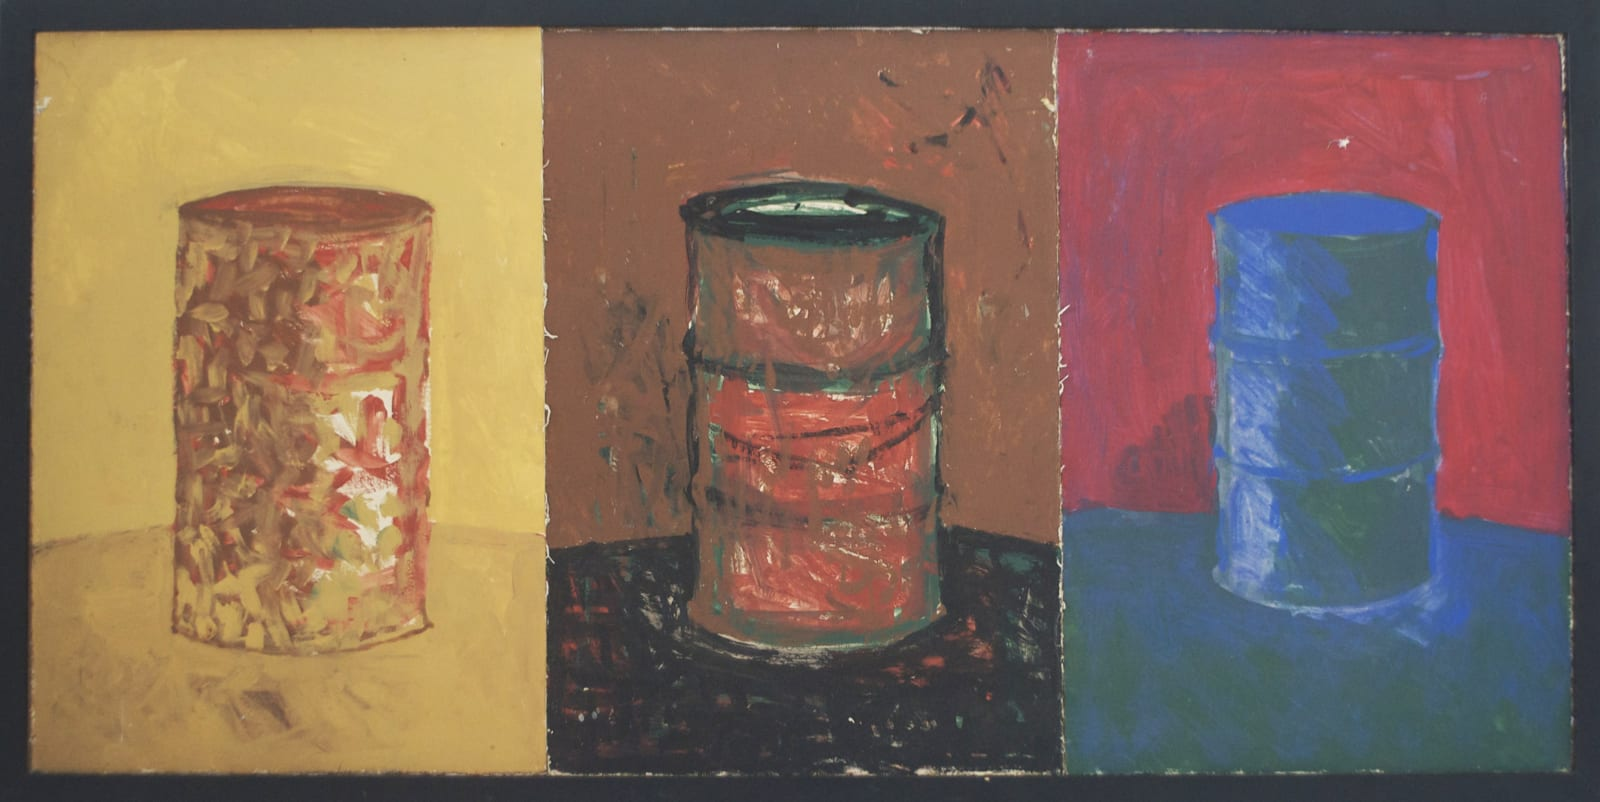 CHANDRAGUPTHA THENUWARA 1997 Barrelism Triptych, Oil on Canvas, 61cmx125cm